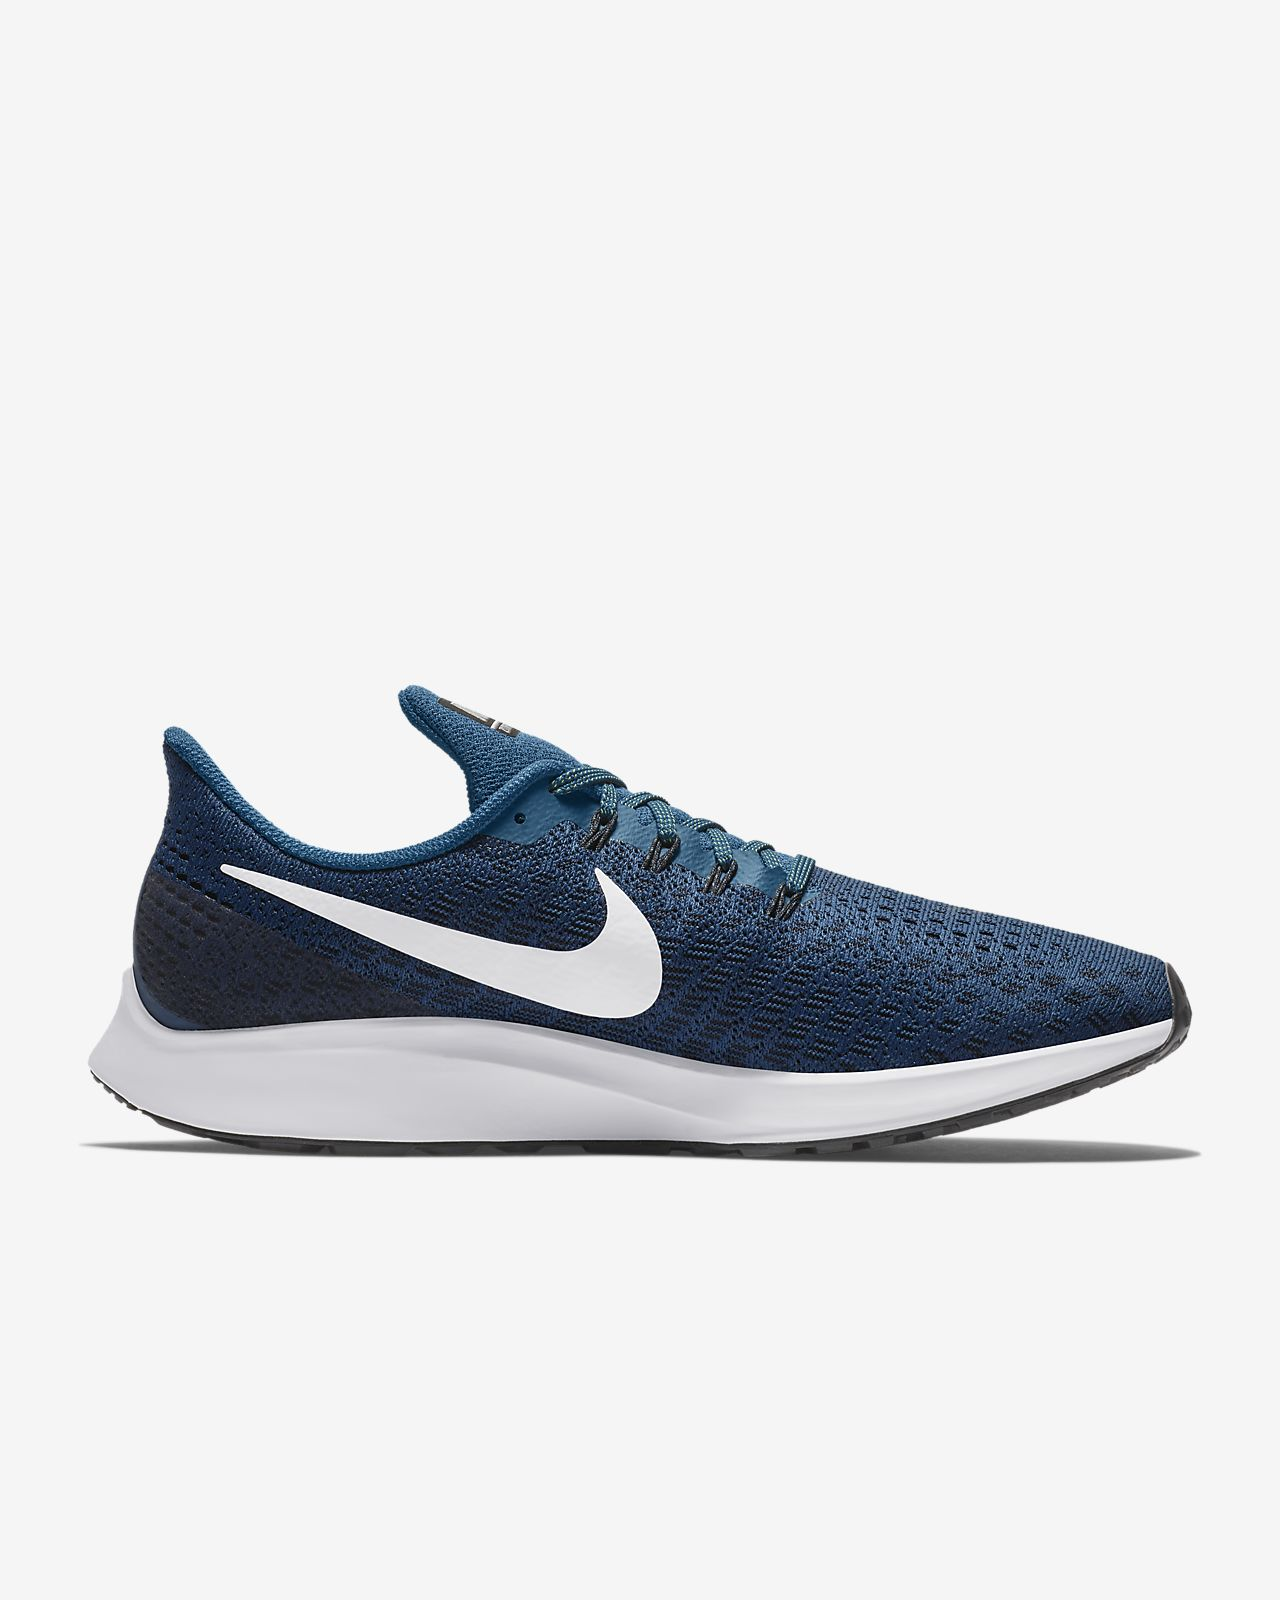 promo code fd2f0 ff903 ... Chaussure de running Nike Air Zoom Pegasus 35 pour Homme